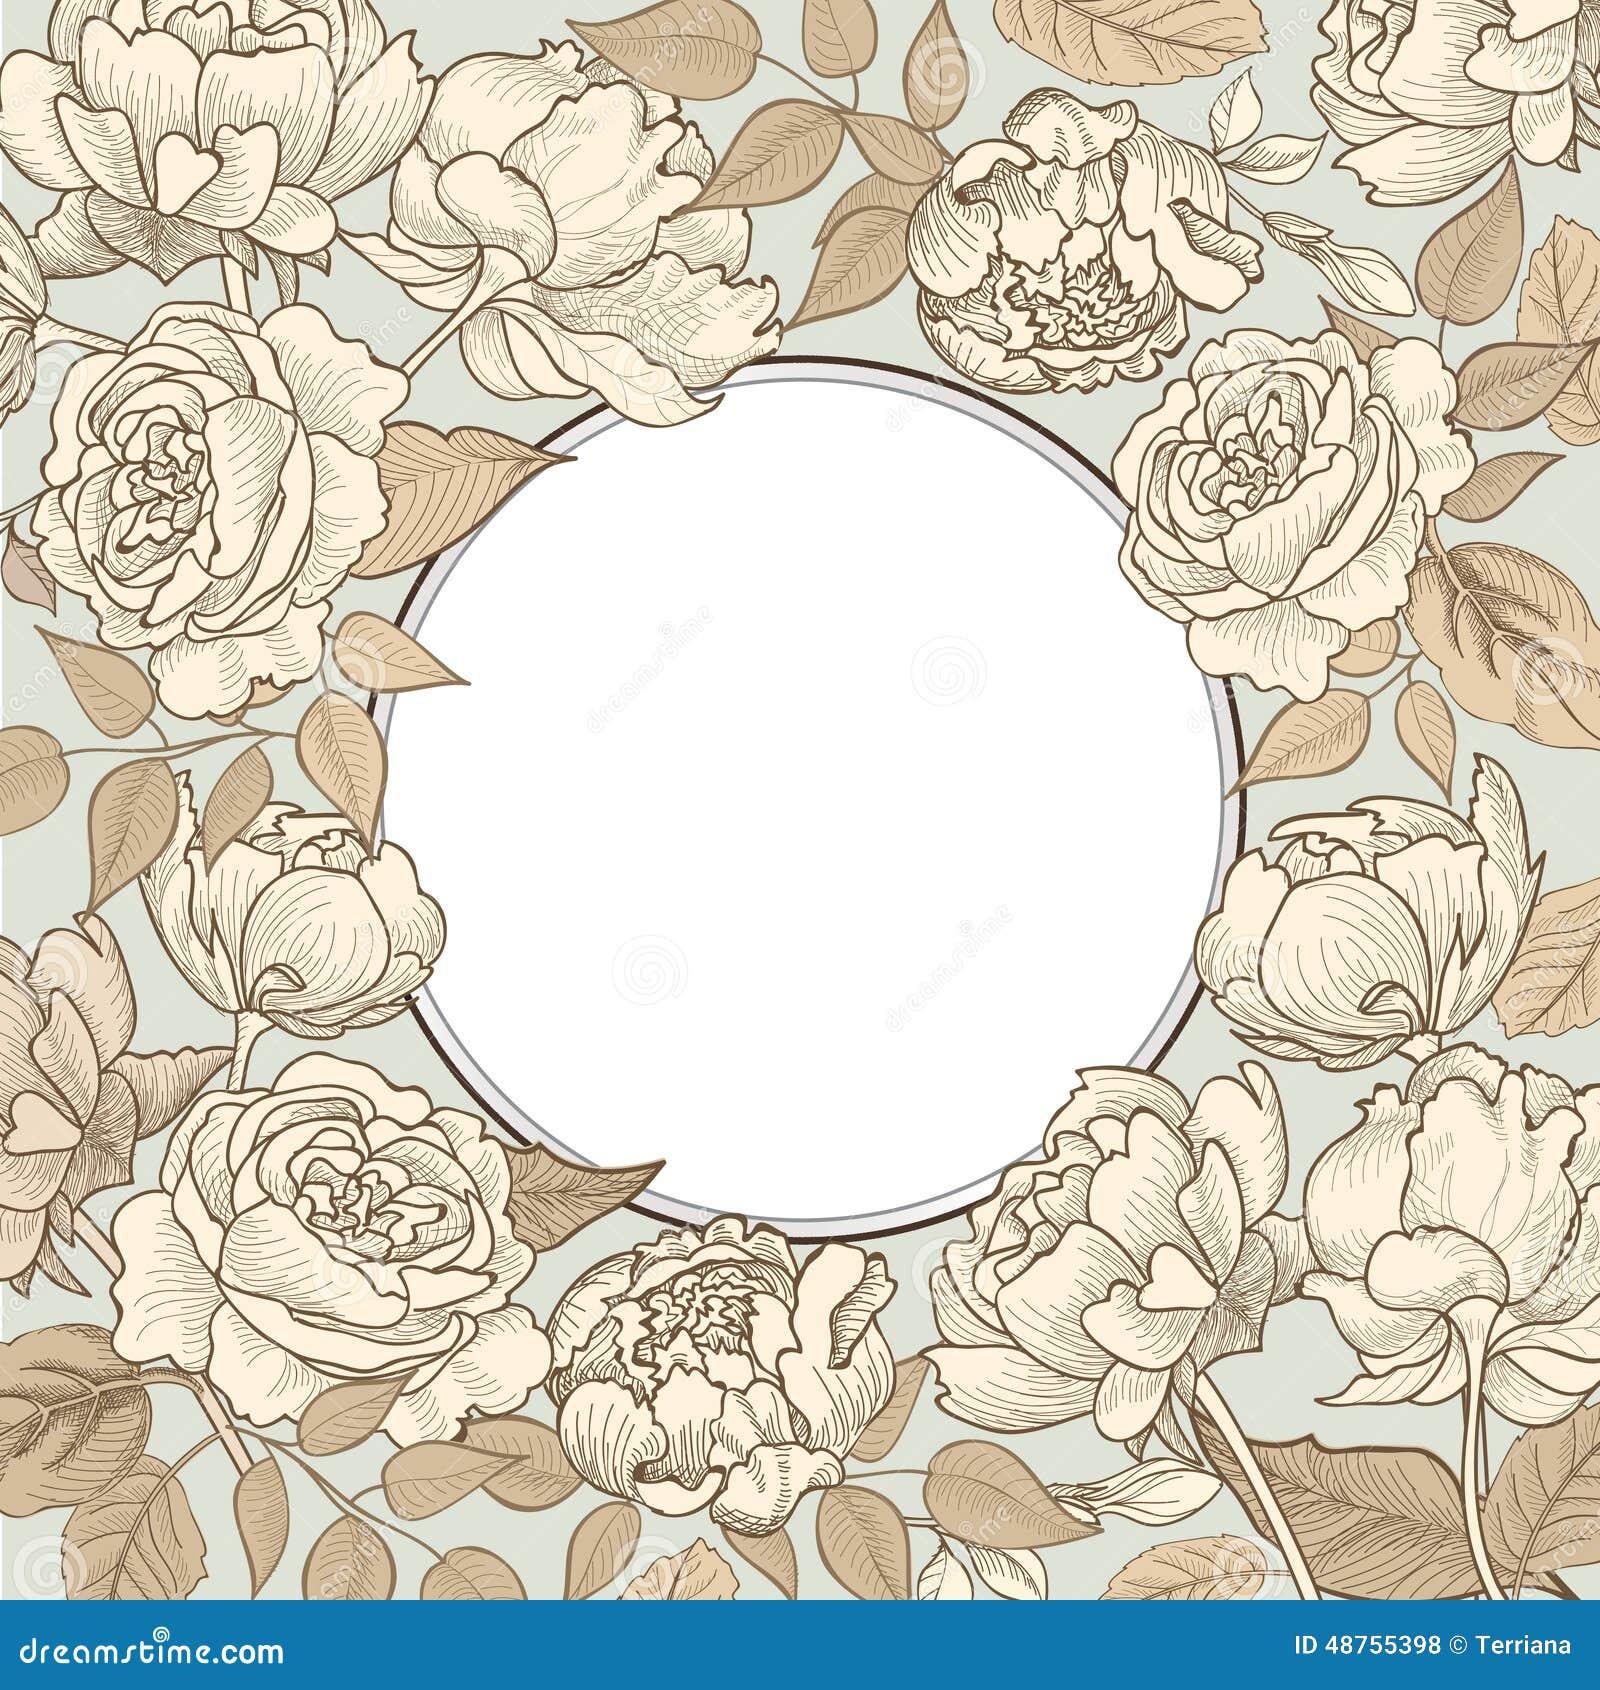 Floral border background. Decorative flower pattern.